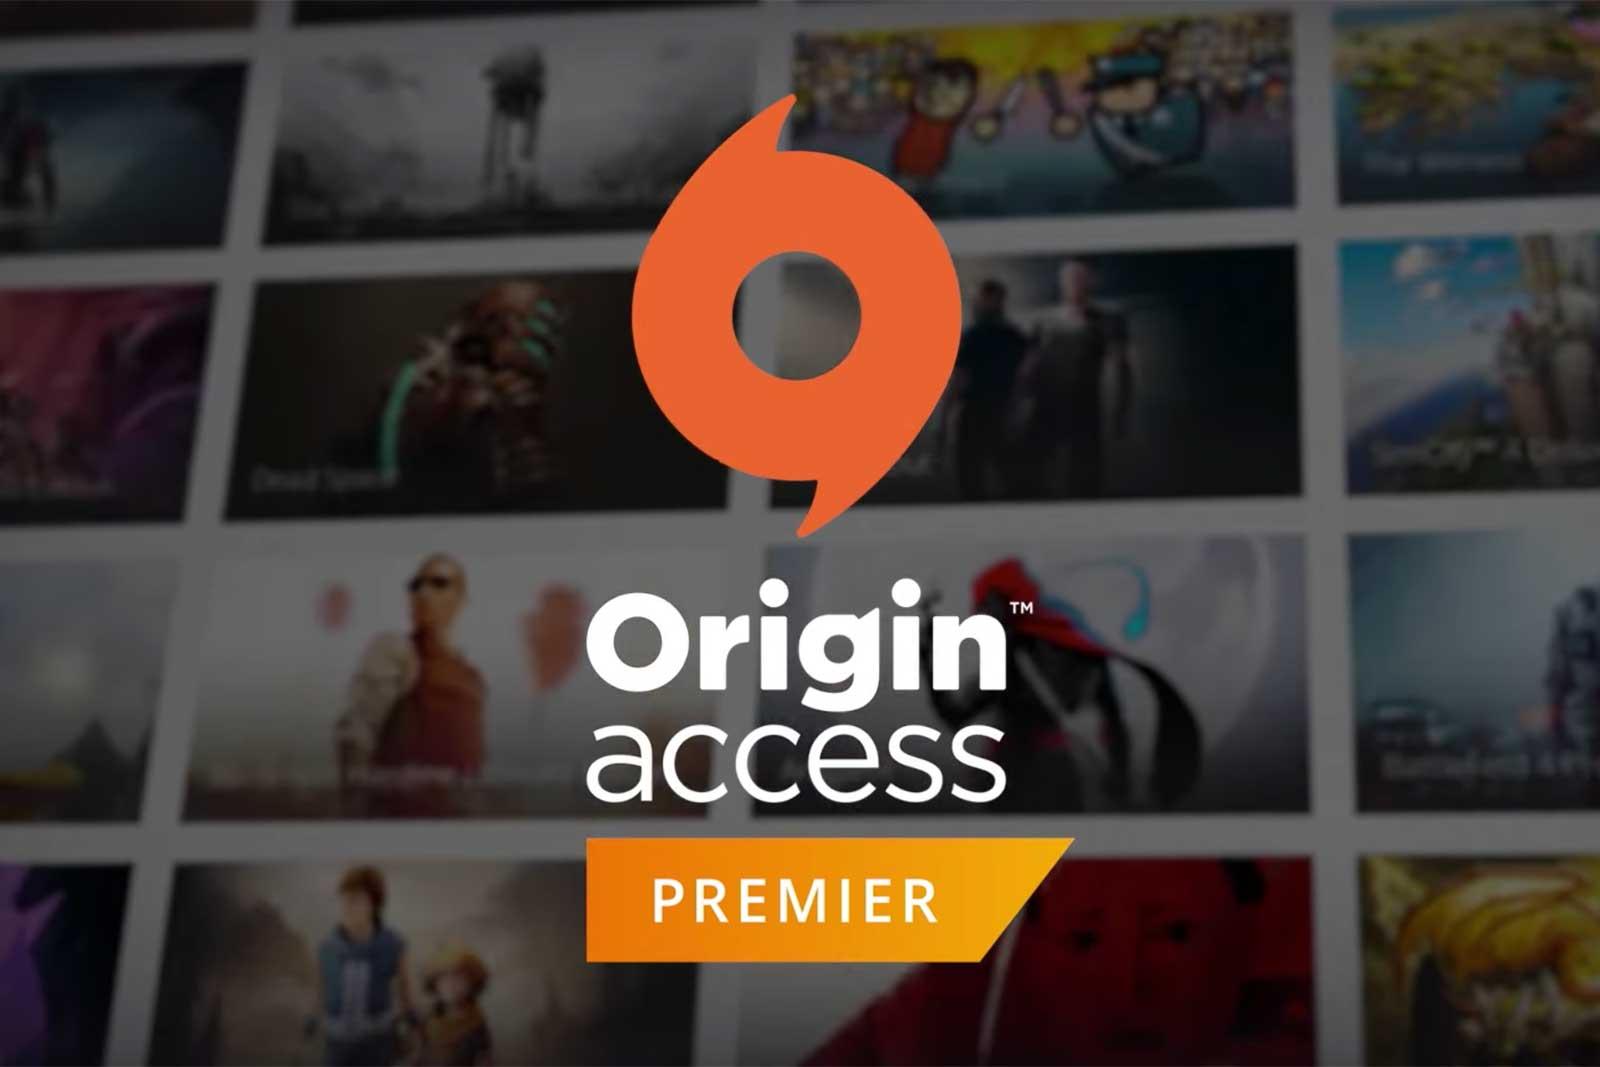 Origin Access Premier service gives you EA's latest games